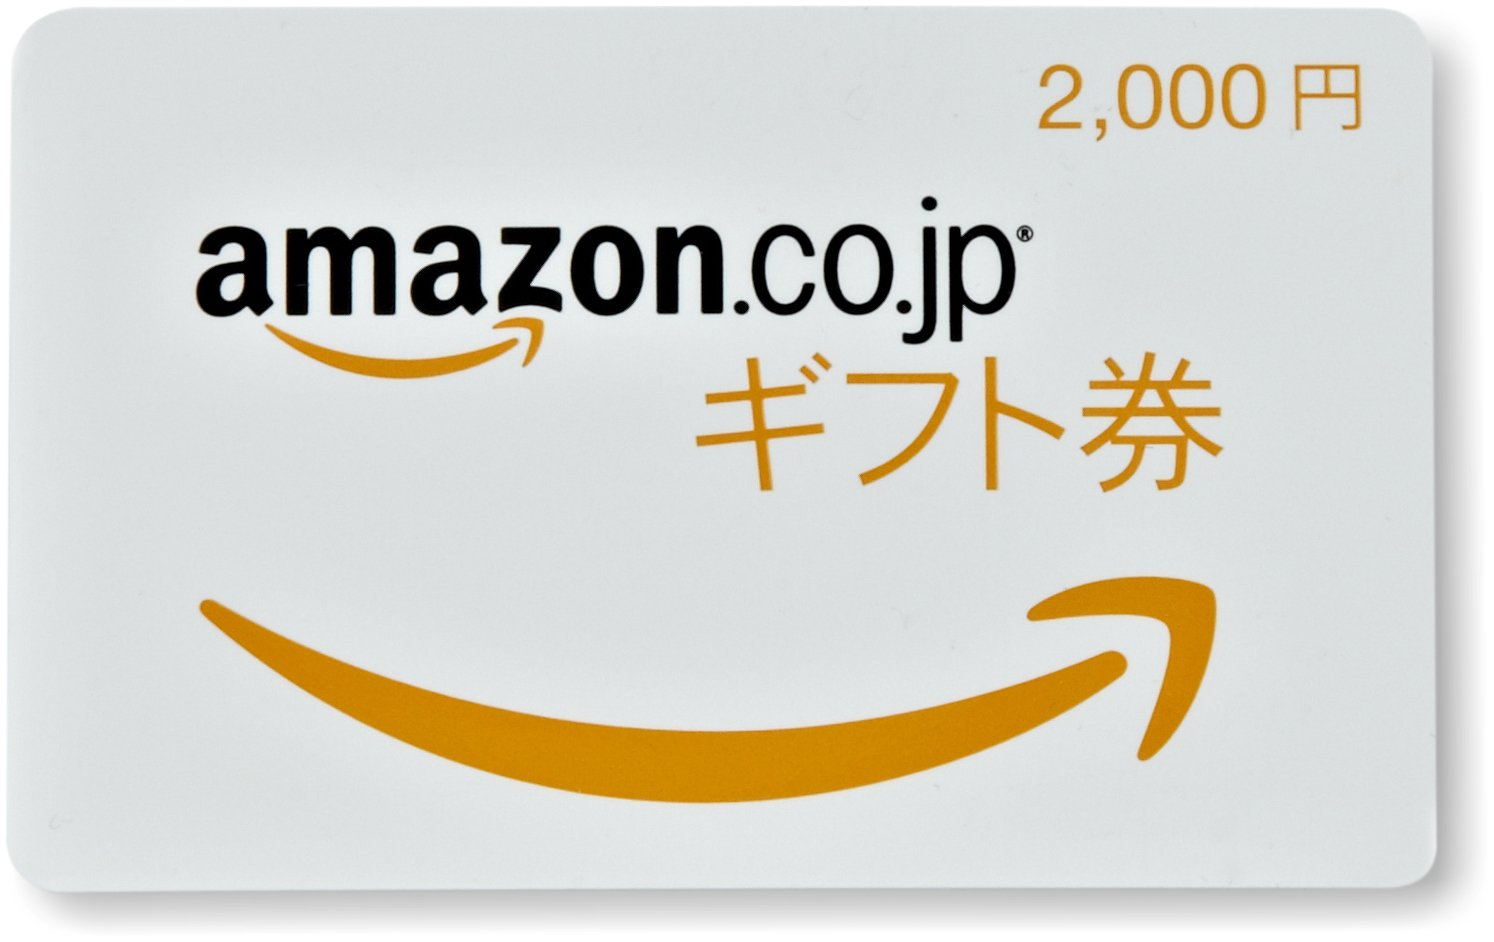 Amazonギフト券 - マルチパック・カードタイプ - 2,000円×10枚 (Amazonオリジナル)